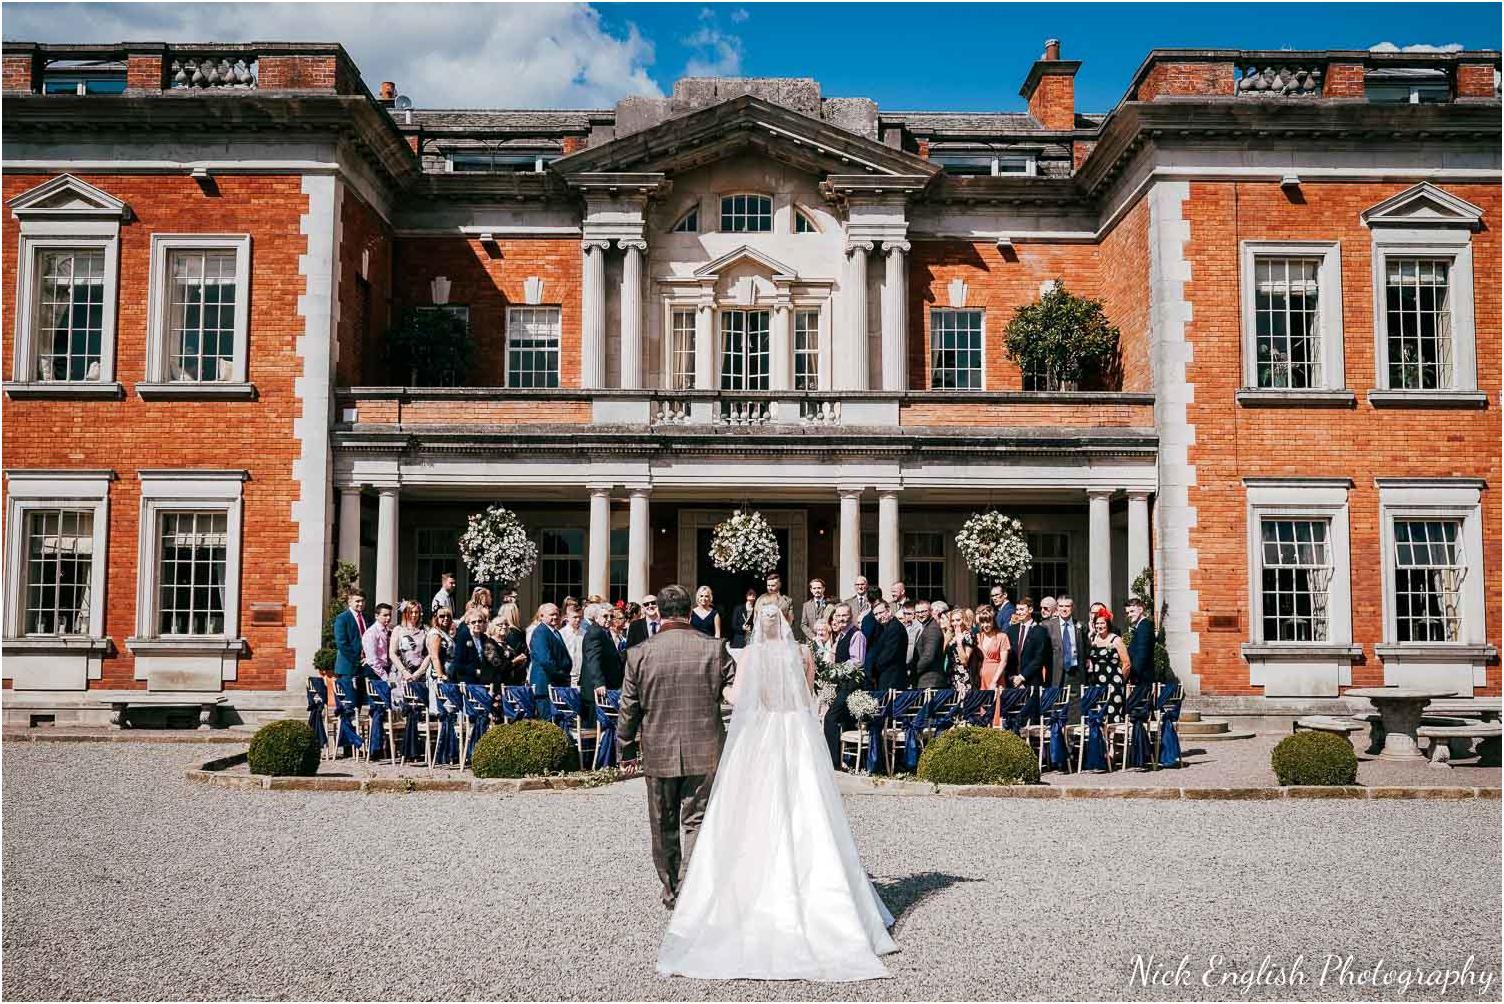 Eaves_Hall_Outdoor_Wedding_Photograph-31.jpg